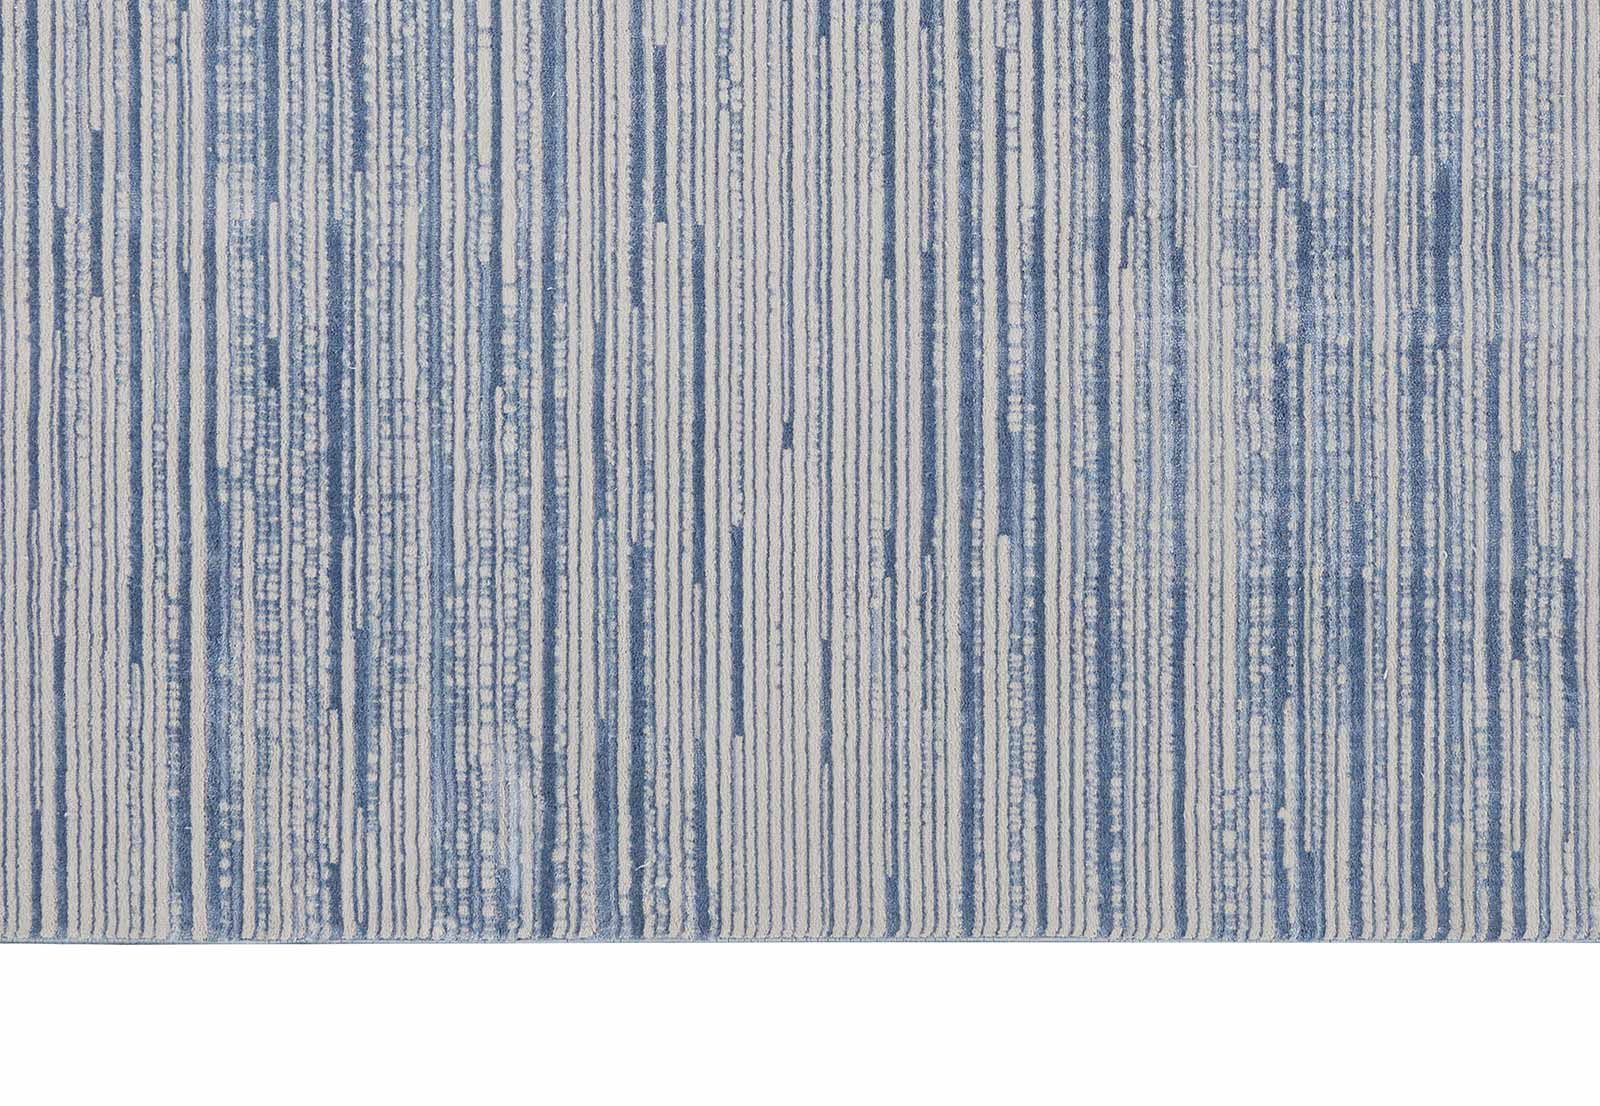 Calvin Klein rug Orlando CK850 CK851 BLUE 8x11 099446487803 ALT